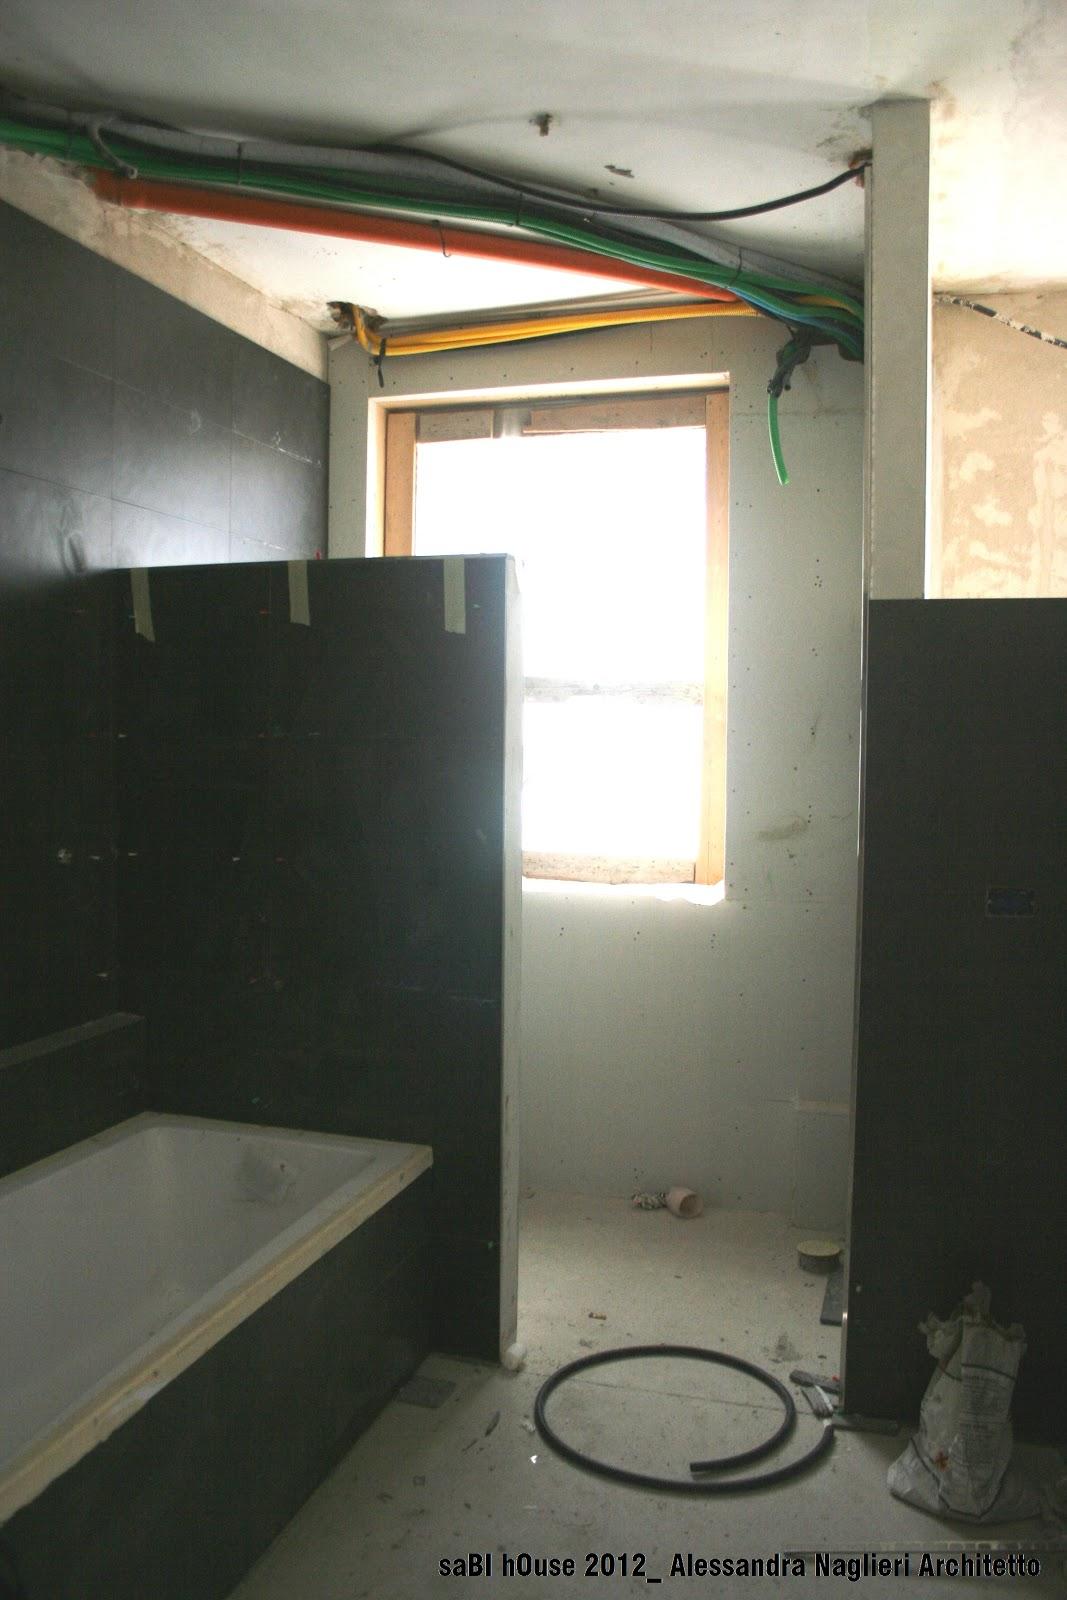 Sabi House Ri Vestire I Bagni Re Clothing The Bathroom